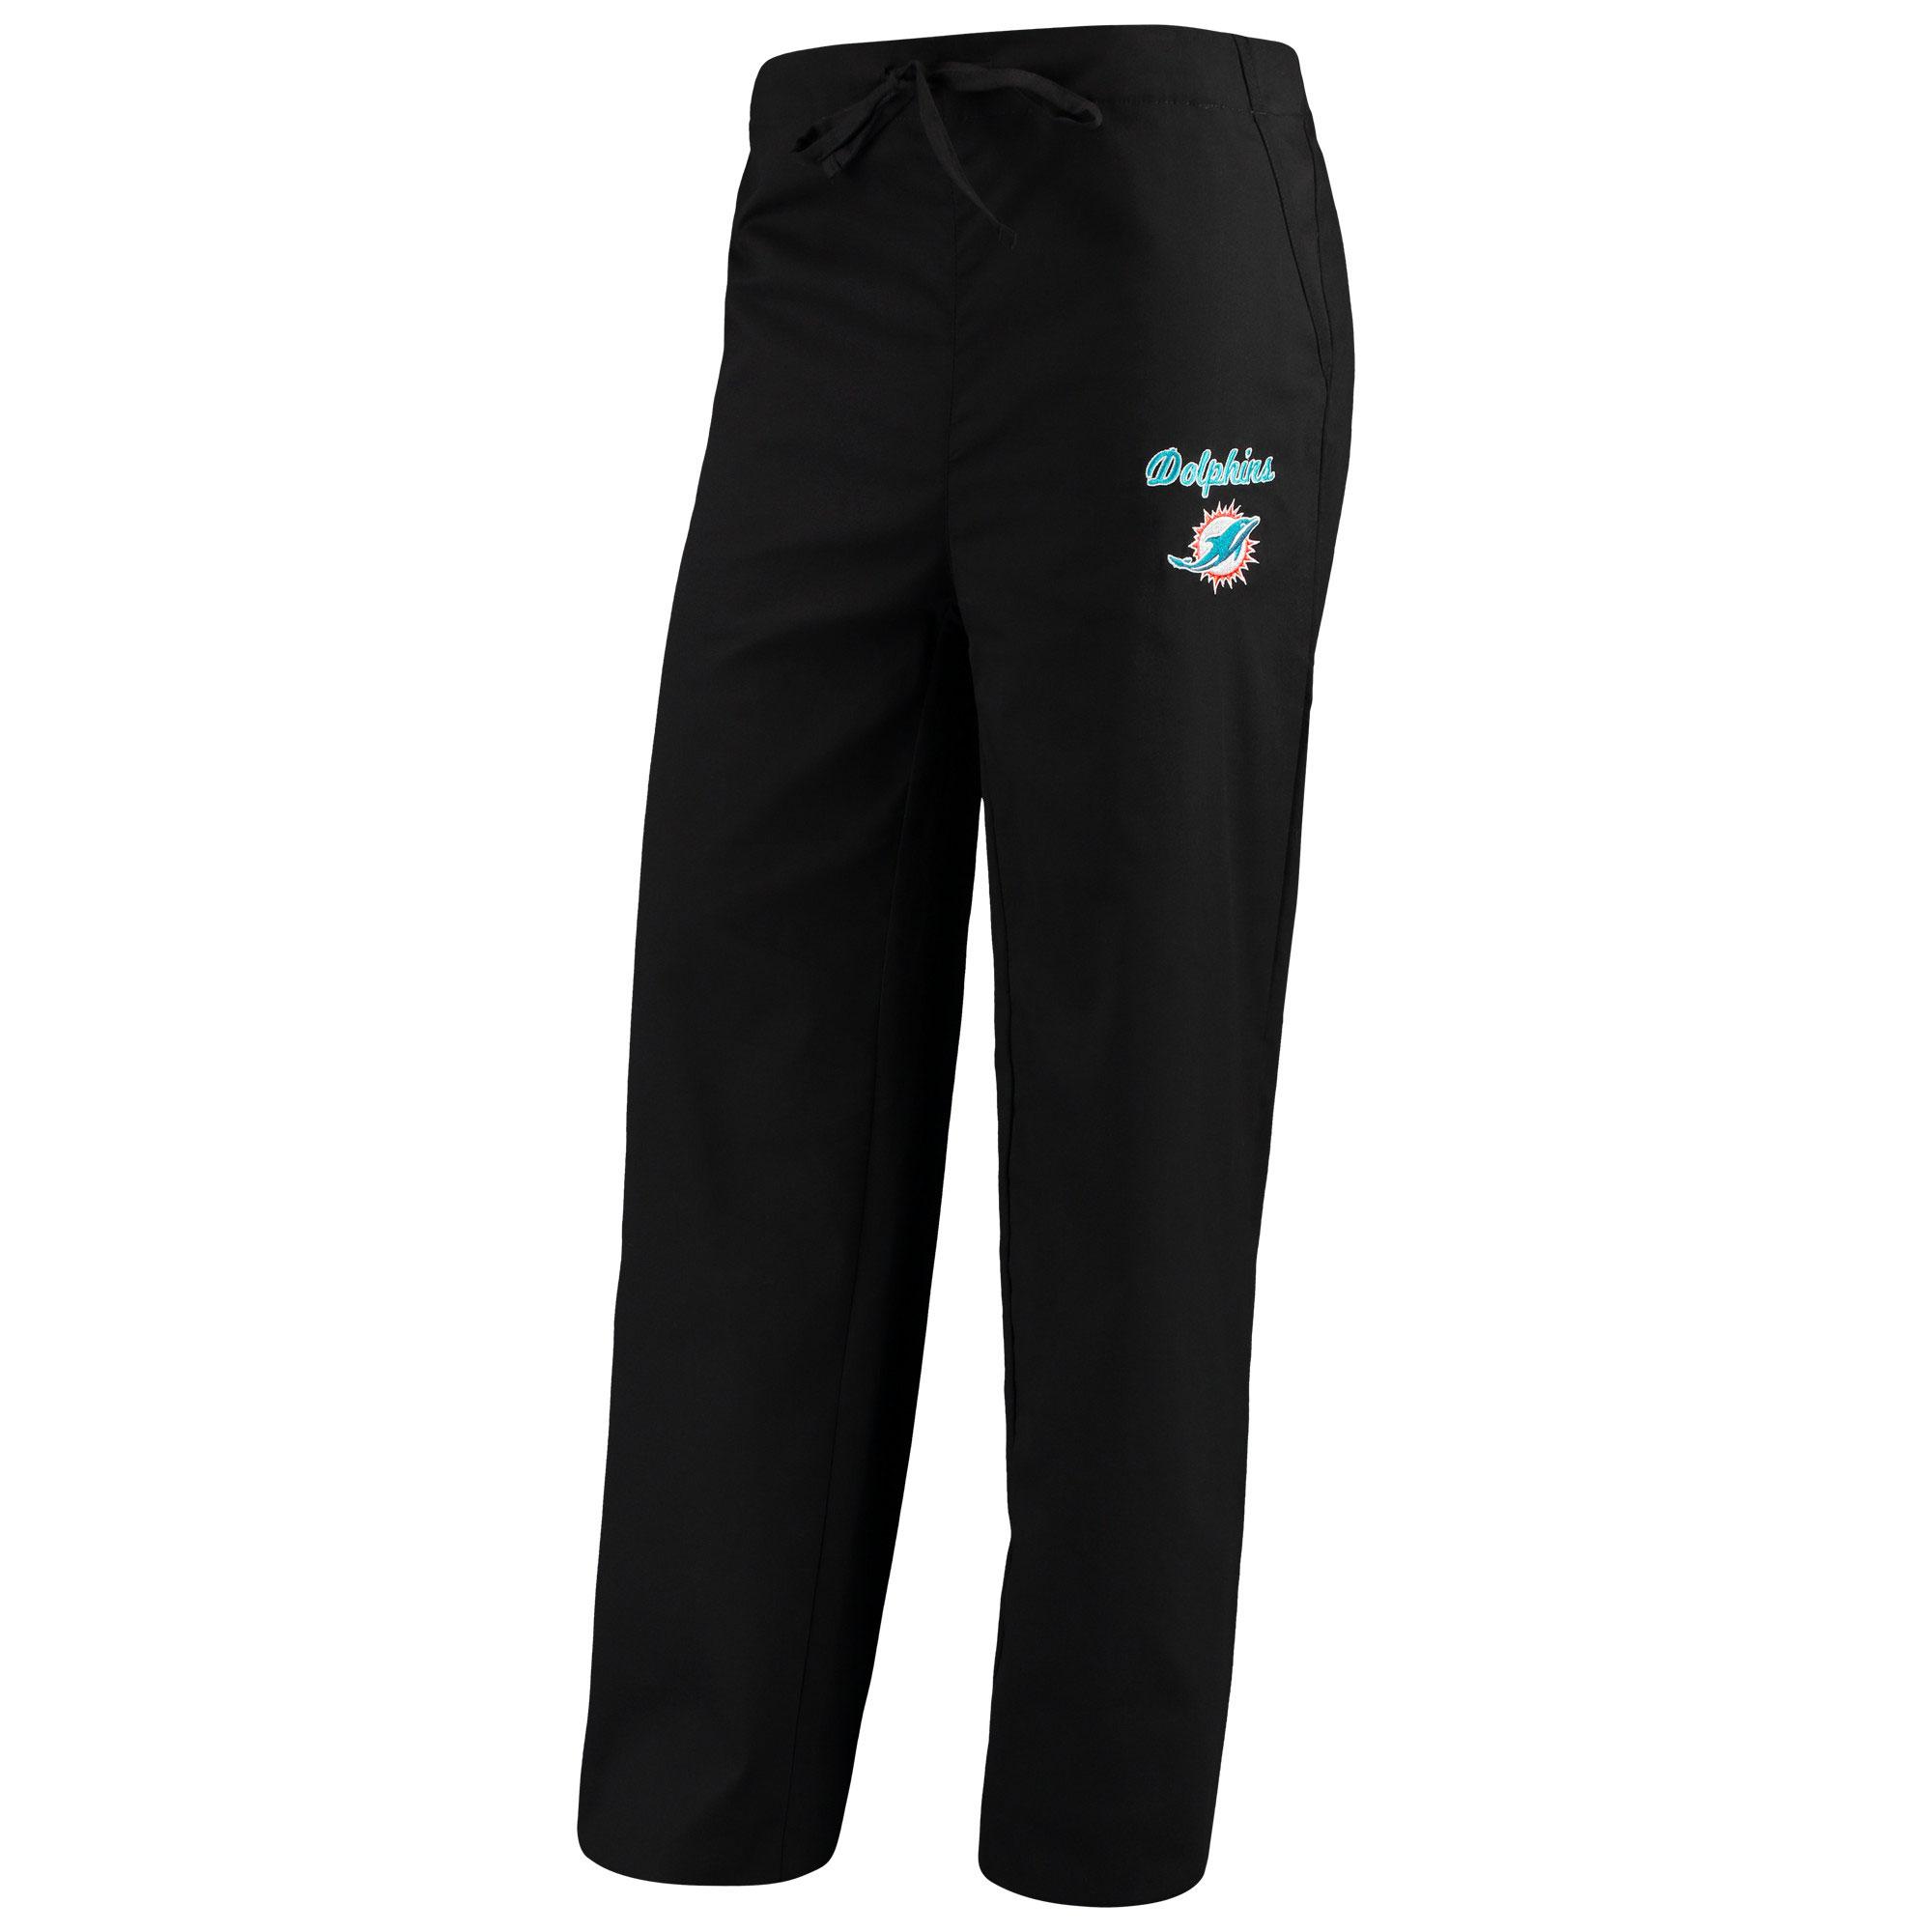 68959ce3 Miami Dolphins Concepts Sport Women's Scrub Pants - Black